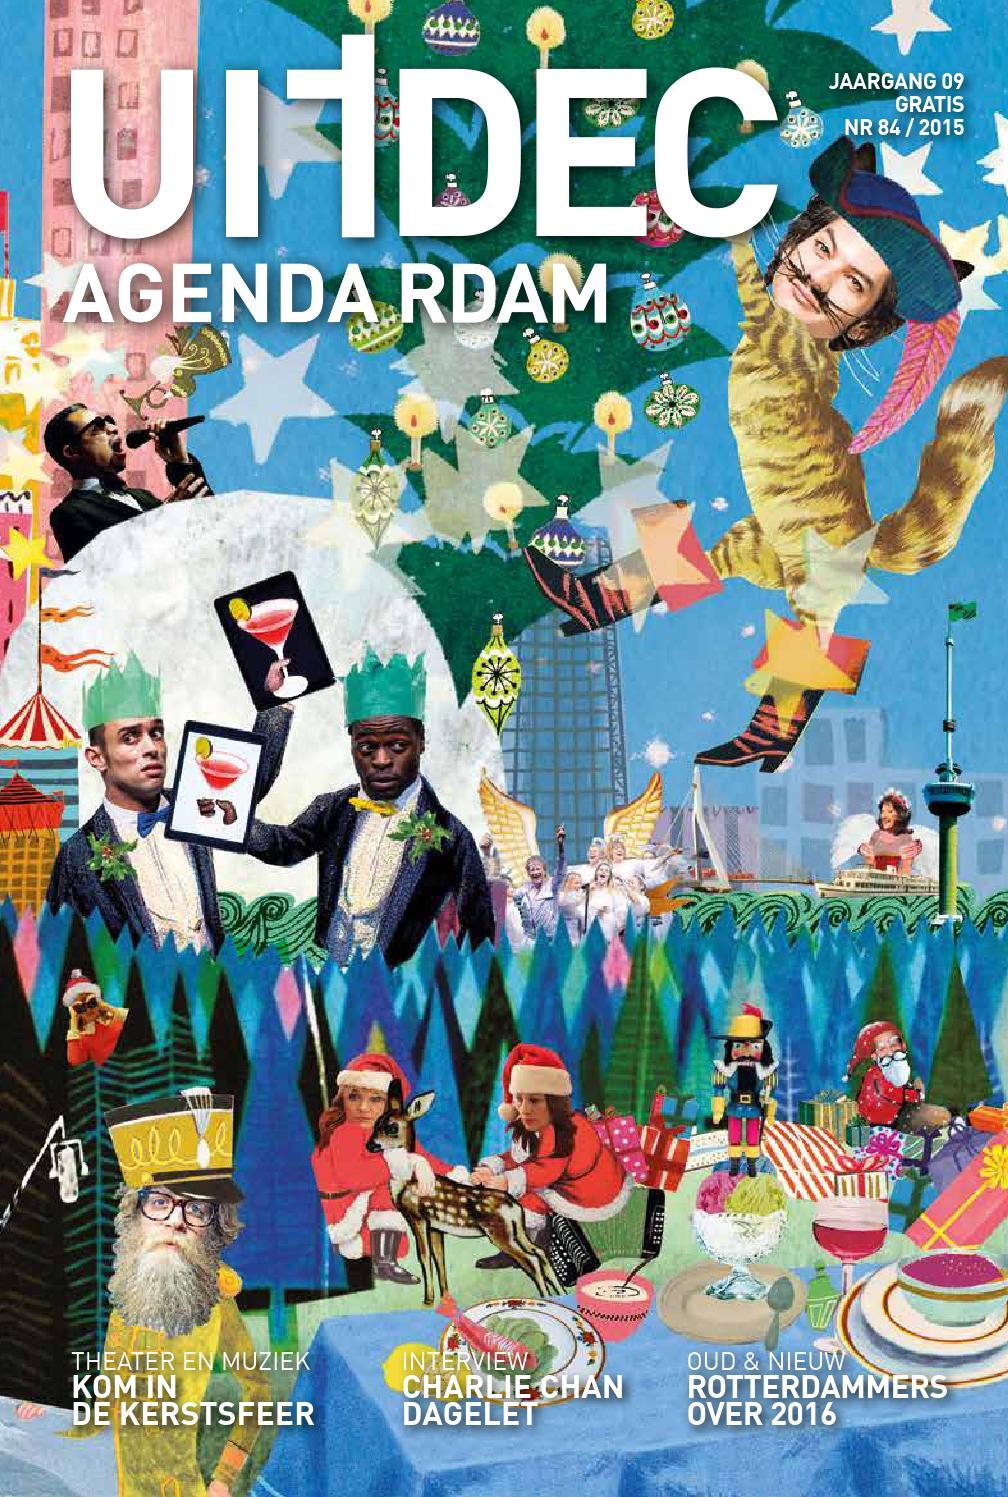 Uitagenda magazine december 2015 by rotterdam festivals for Uit agenda rotterdam